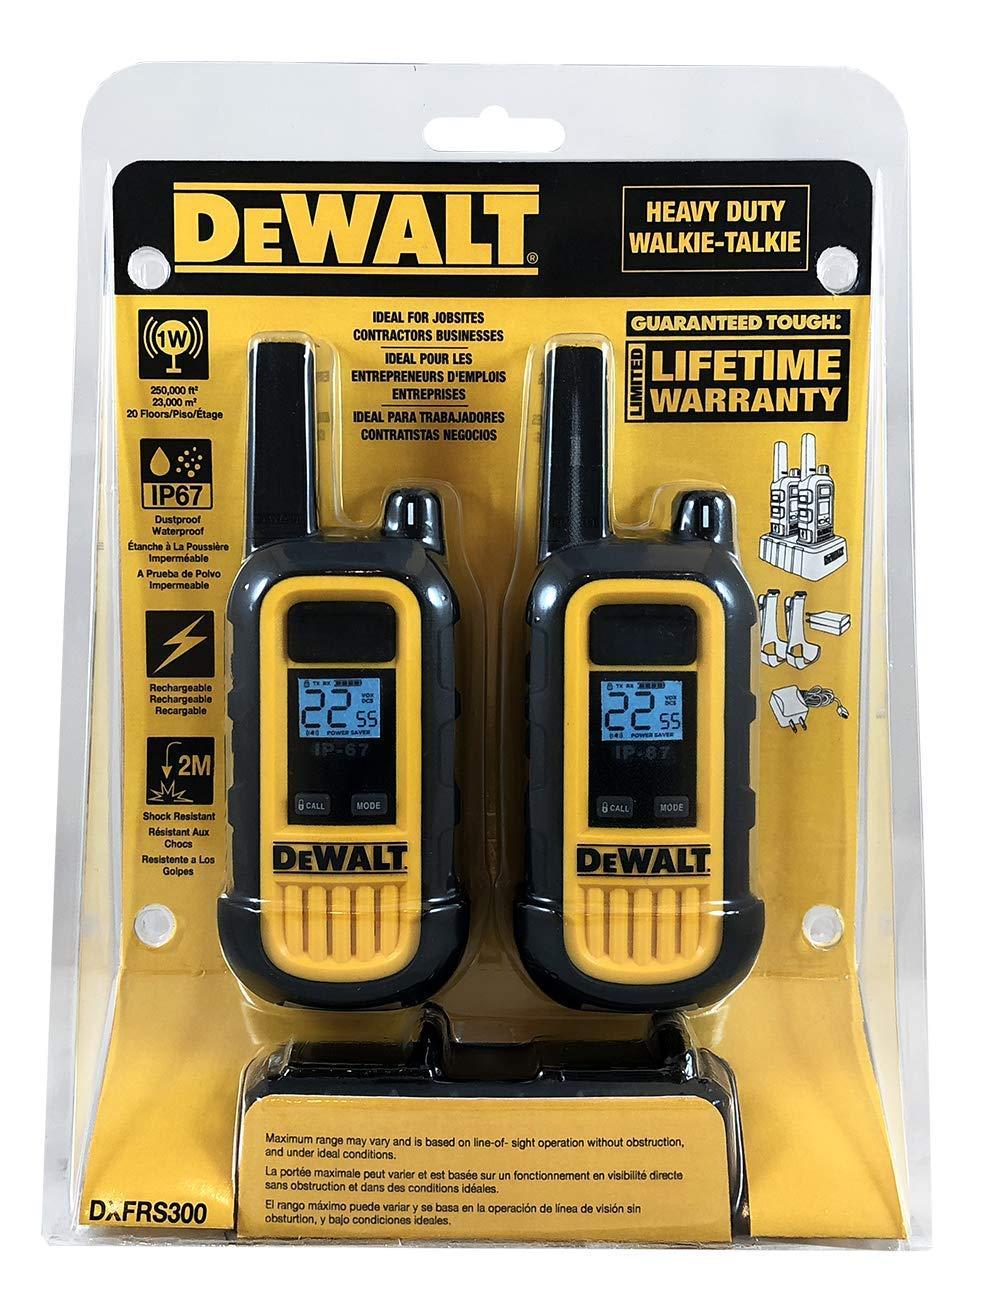 DeWALT DXFRS300 1W Walkie Talkies Heavy Duty Business Two-Way Radios (Pair) by DEWALT (Image #12)